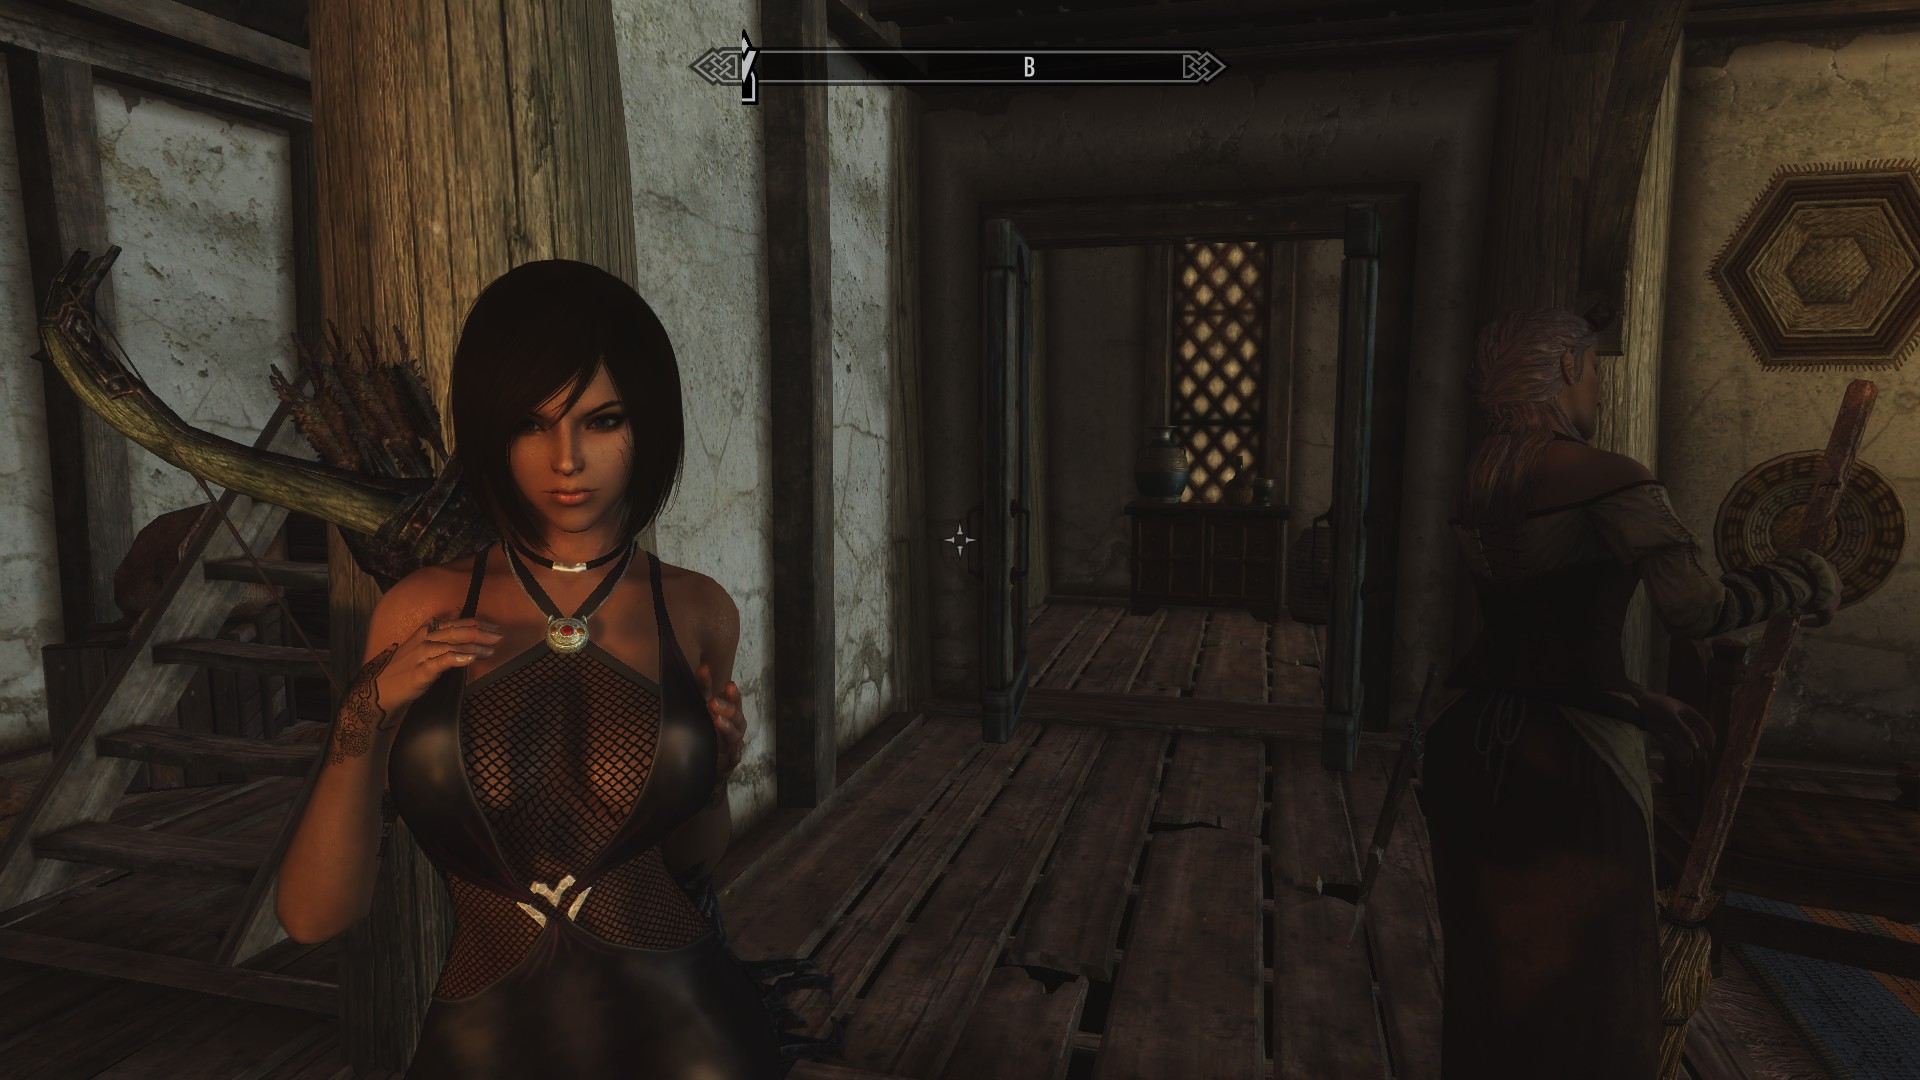 мой перс - Elder Scrolls 5: Skyrim, the